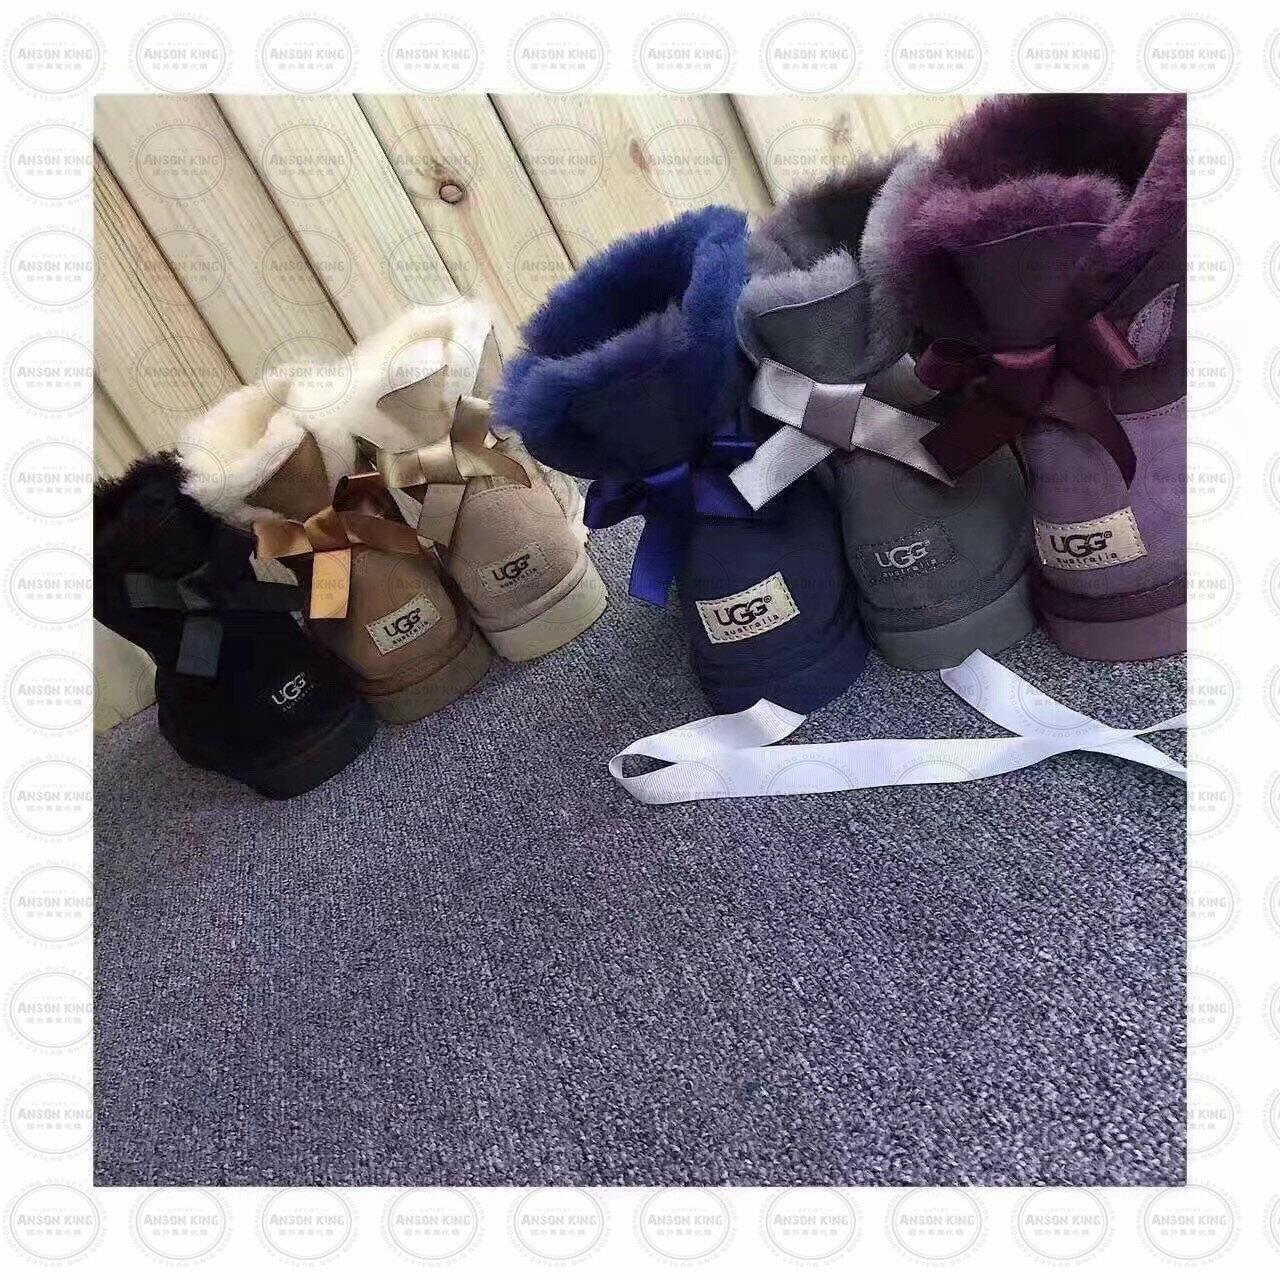 OUTLET正品代購 澳洲 UGG 單蝴蝶結羊皮毛一體 中長靴 保暖 真皮羊皮毛 雪靴 短靴 駝色 1